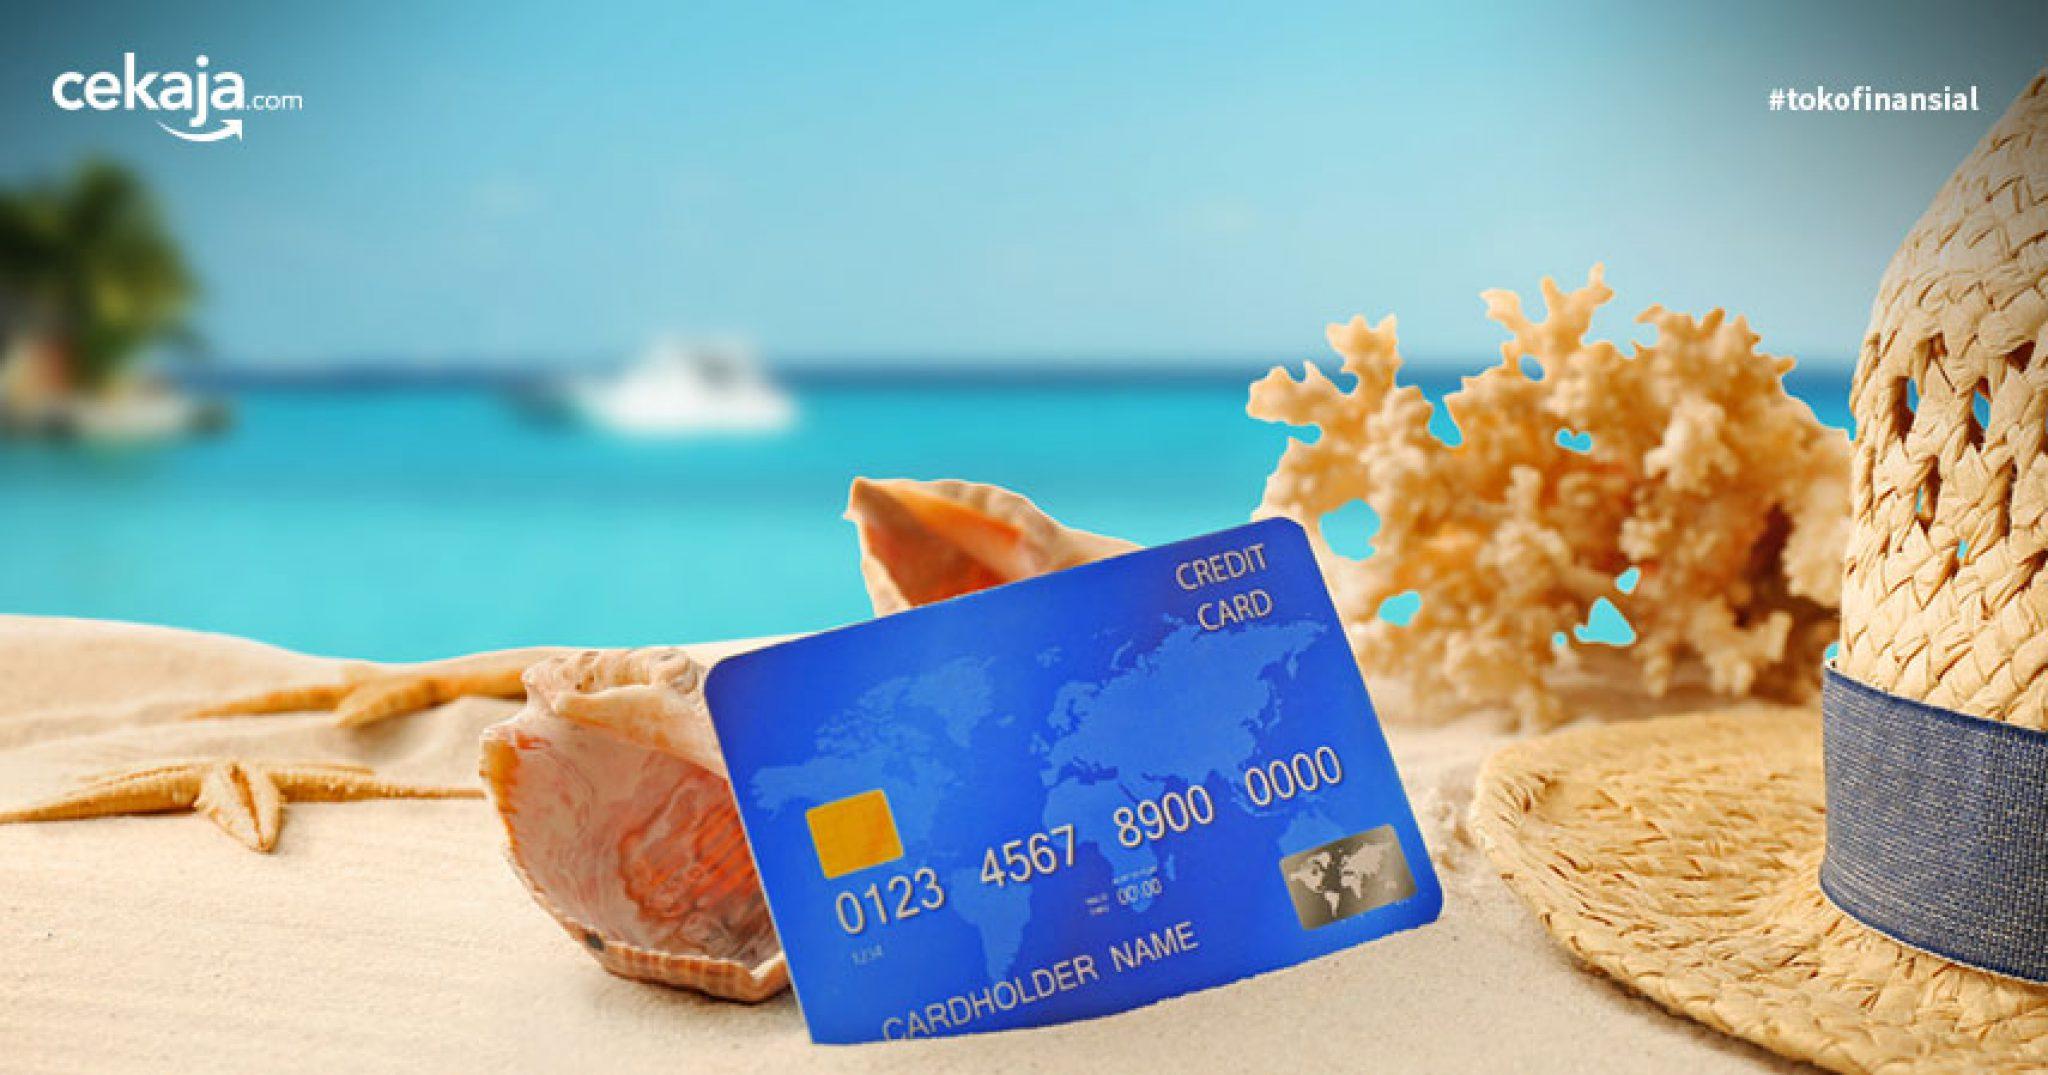 ini kartu kredit yang kasih promo tiket pesawat diskon dan cicilan rh cekaja com